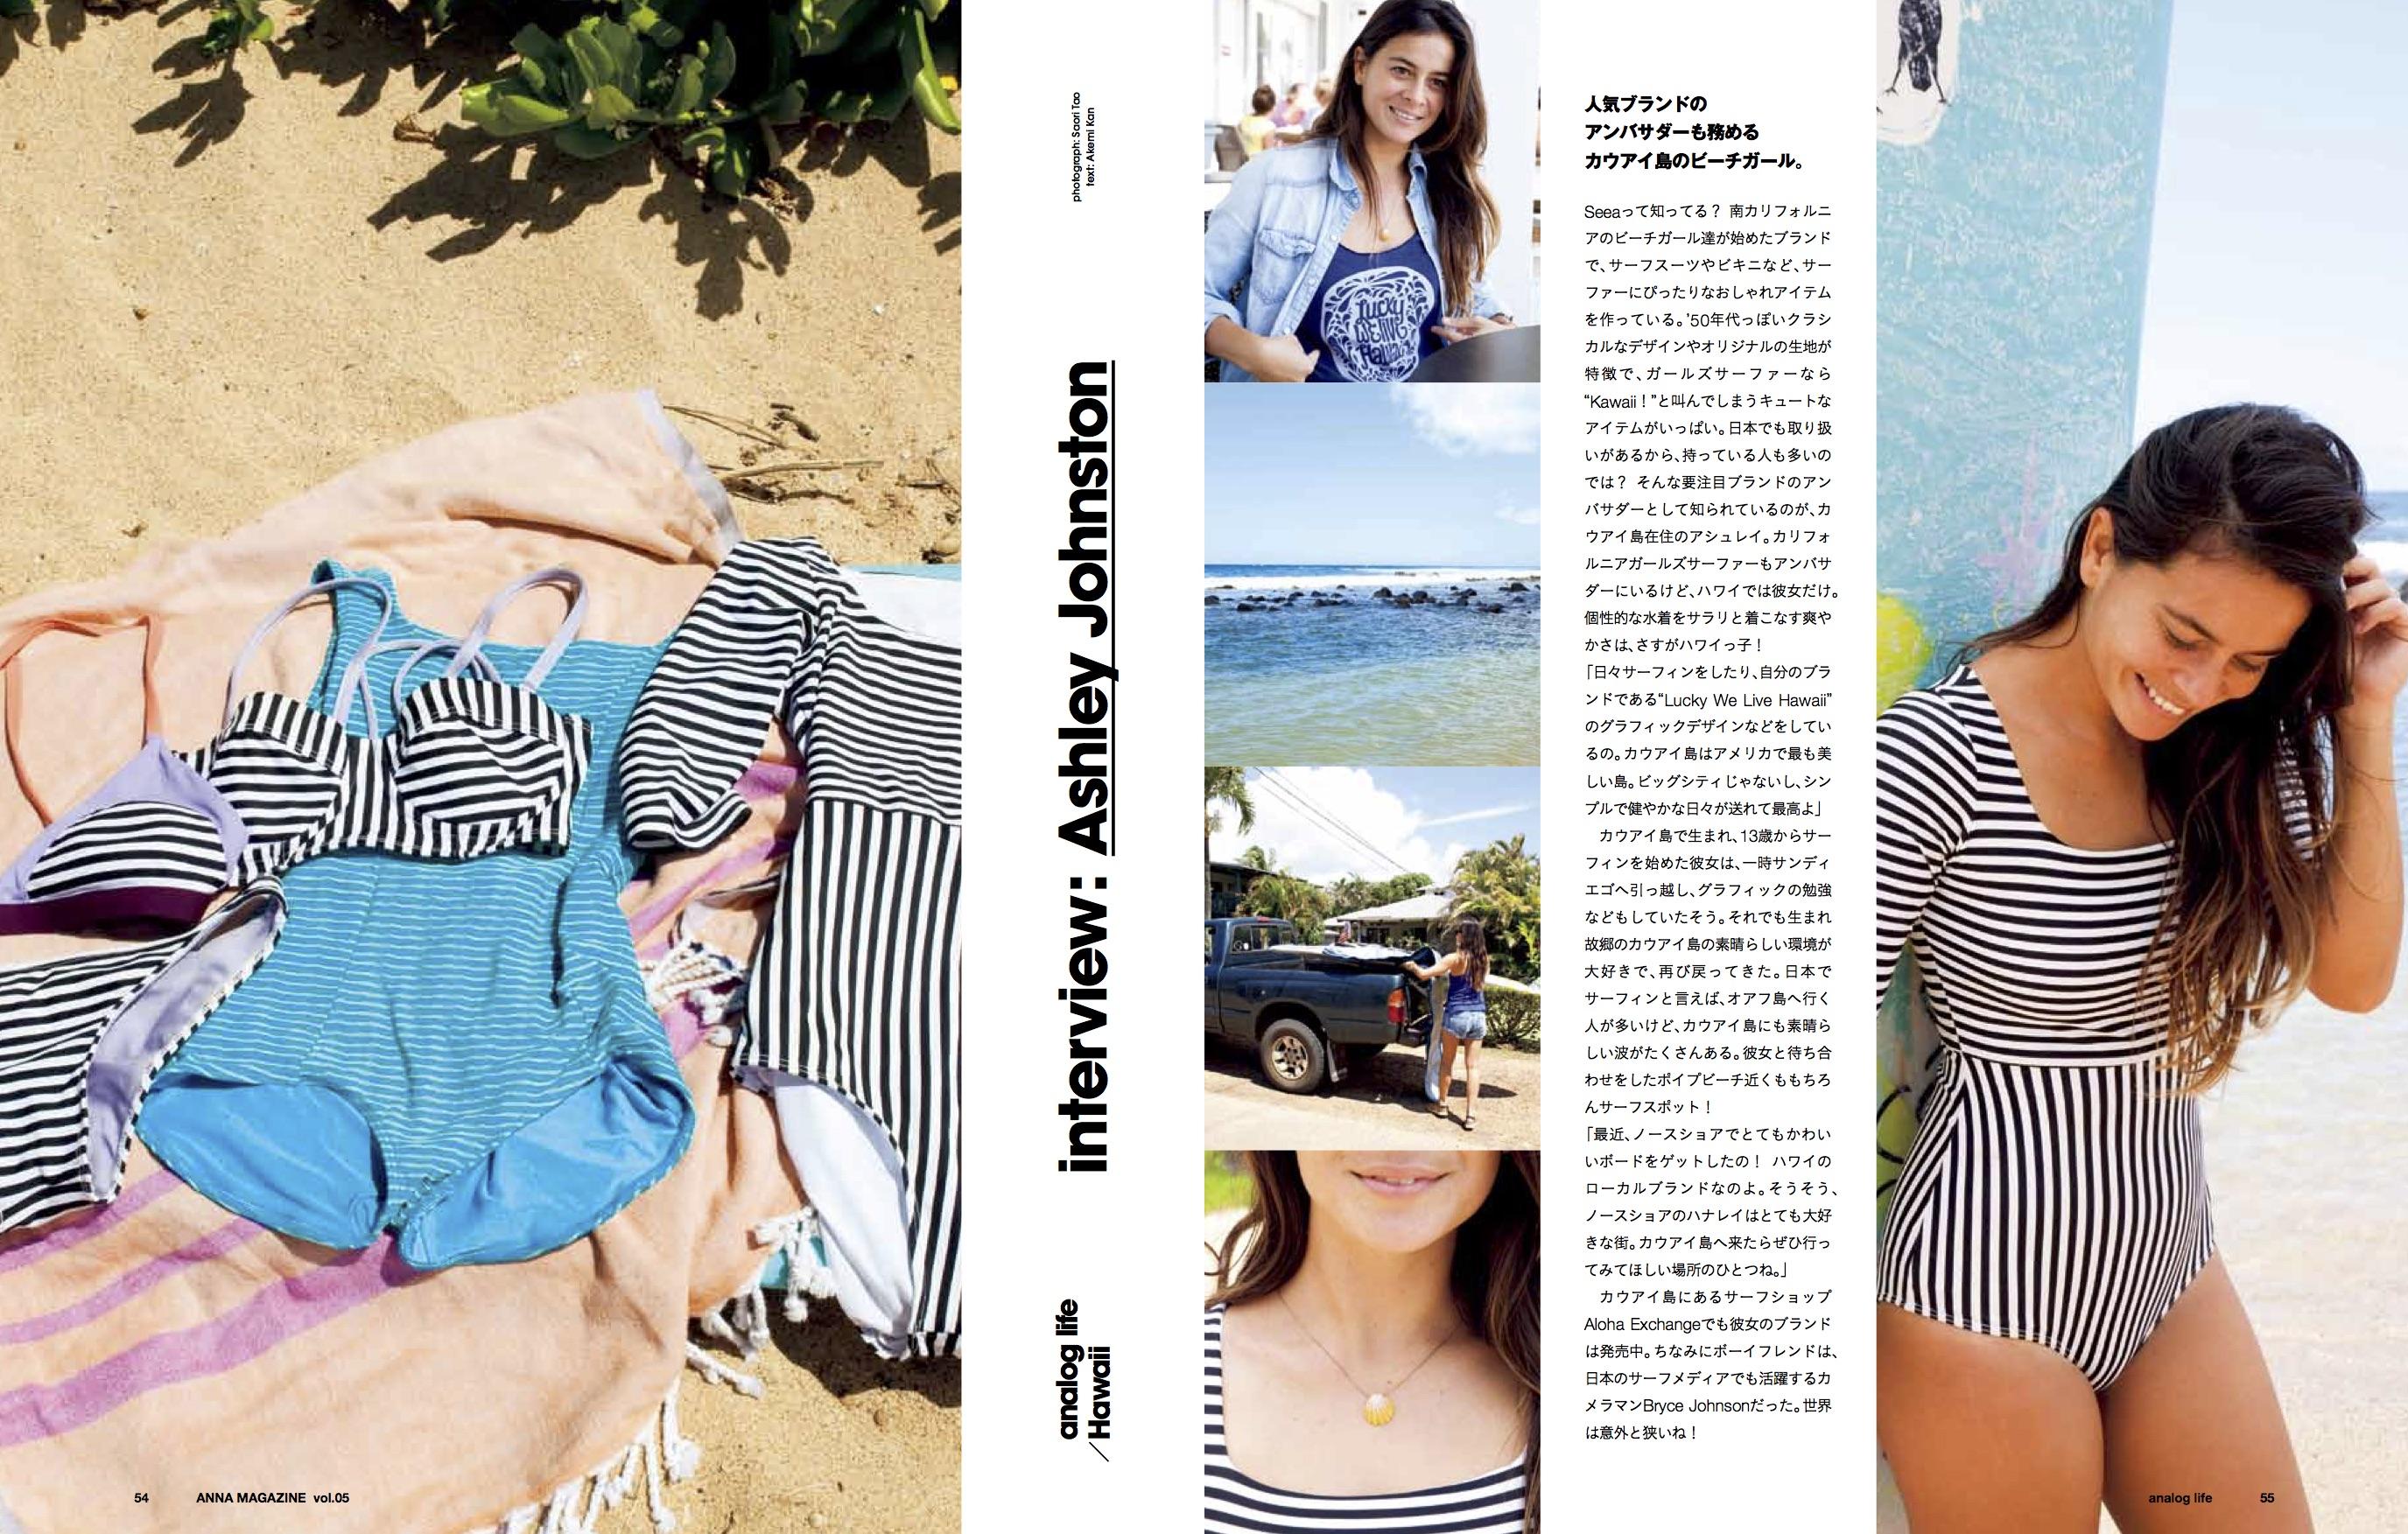 anna magazine Vol.5 P11